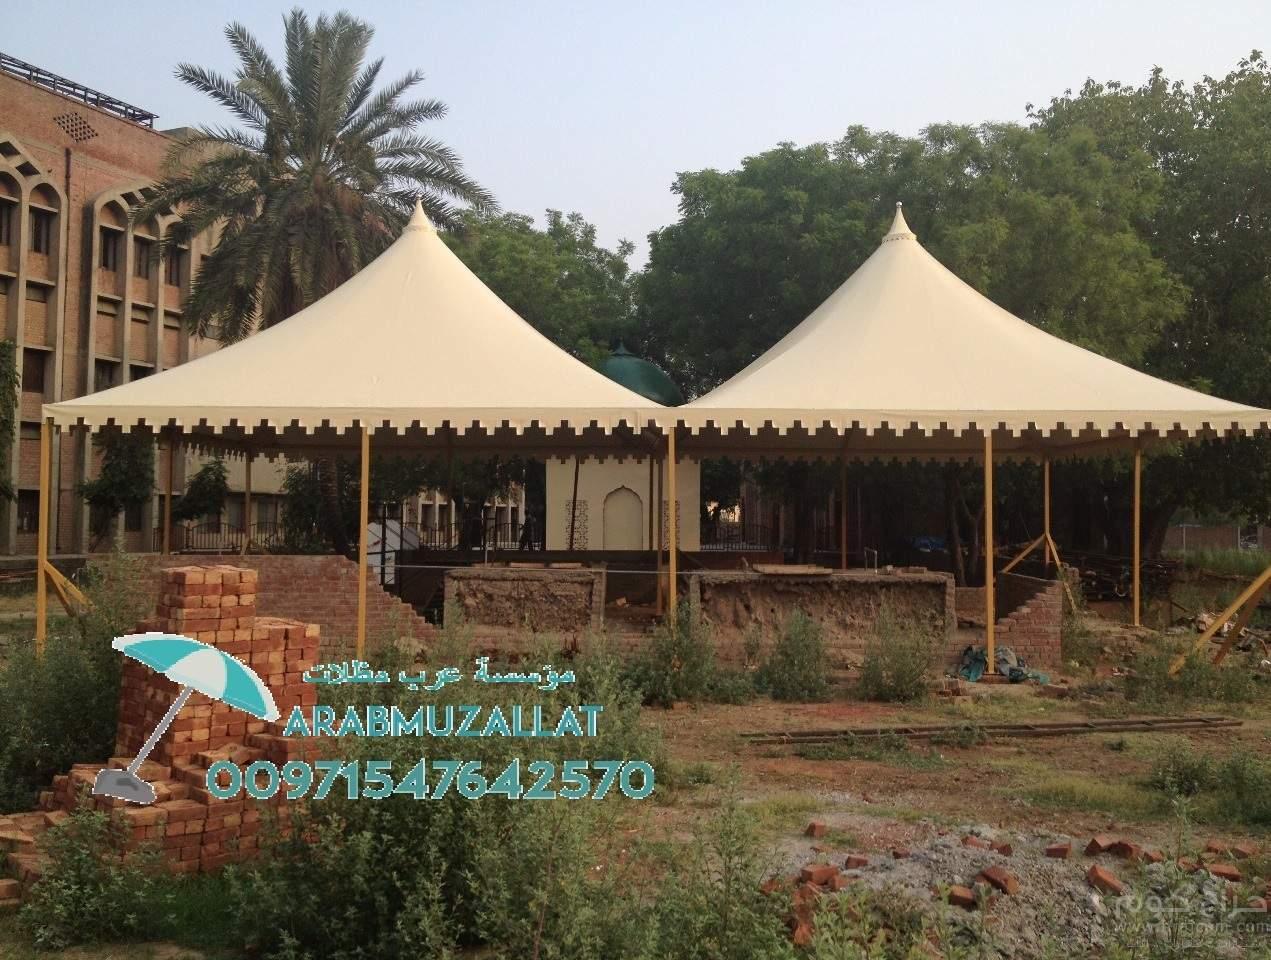 تصميم وتنفيذ جميع انواع مظلات وسواتر 00971547642570